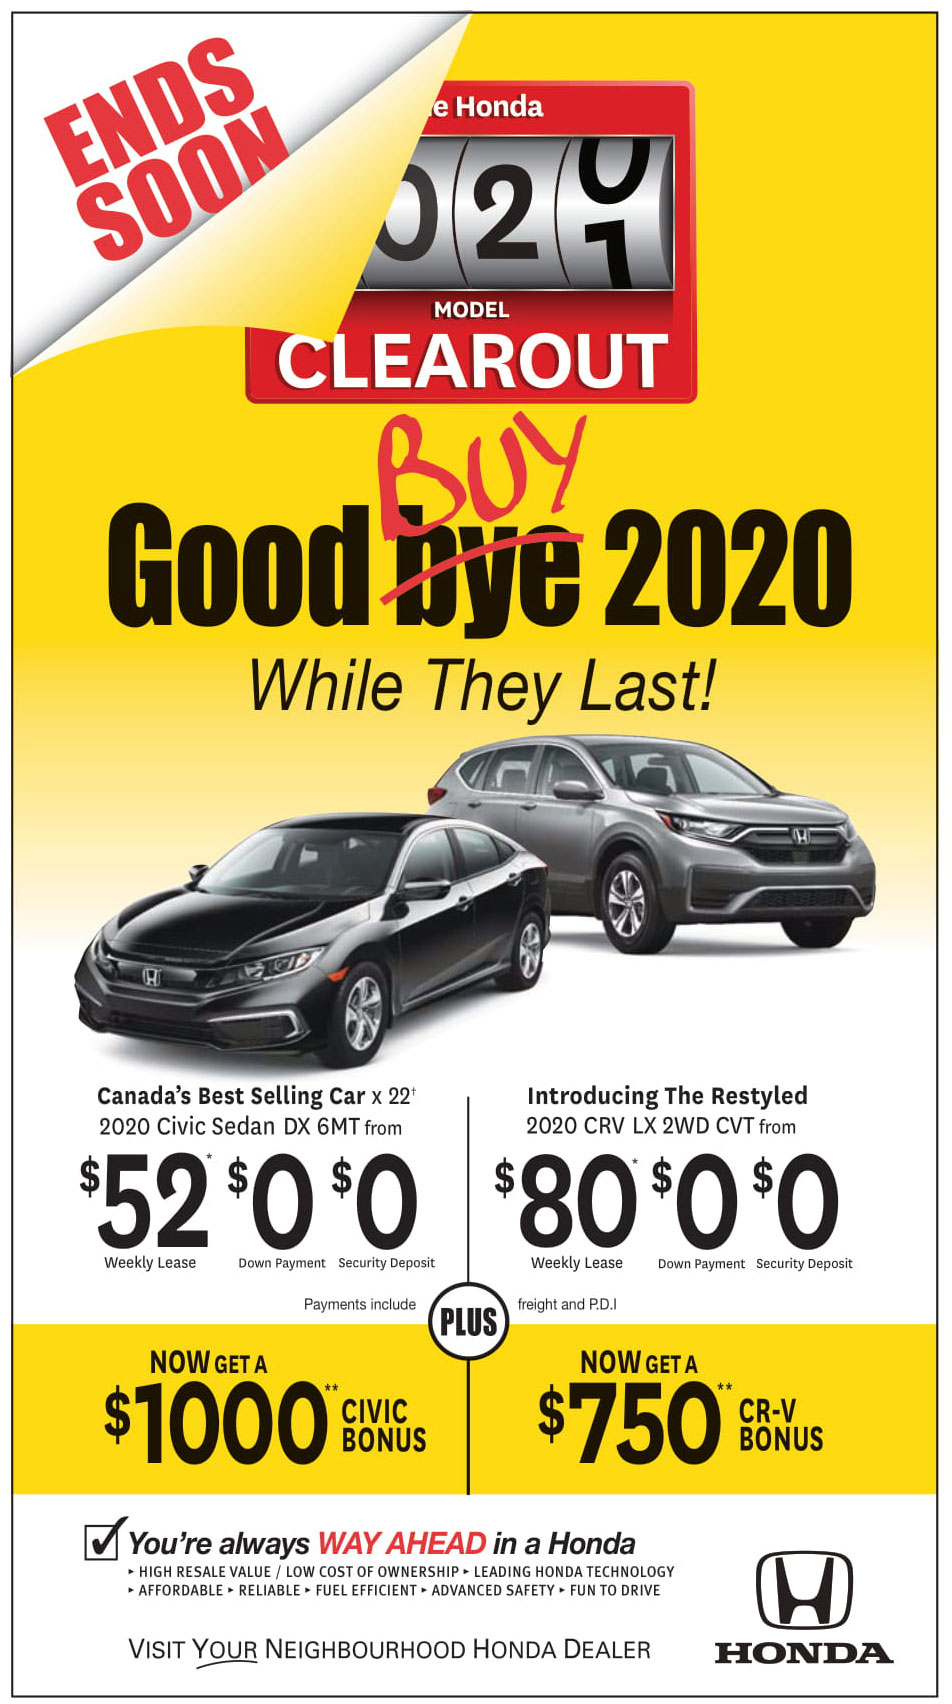 Good Buy 2020